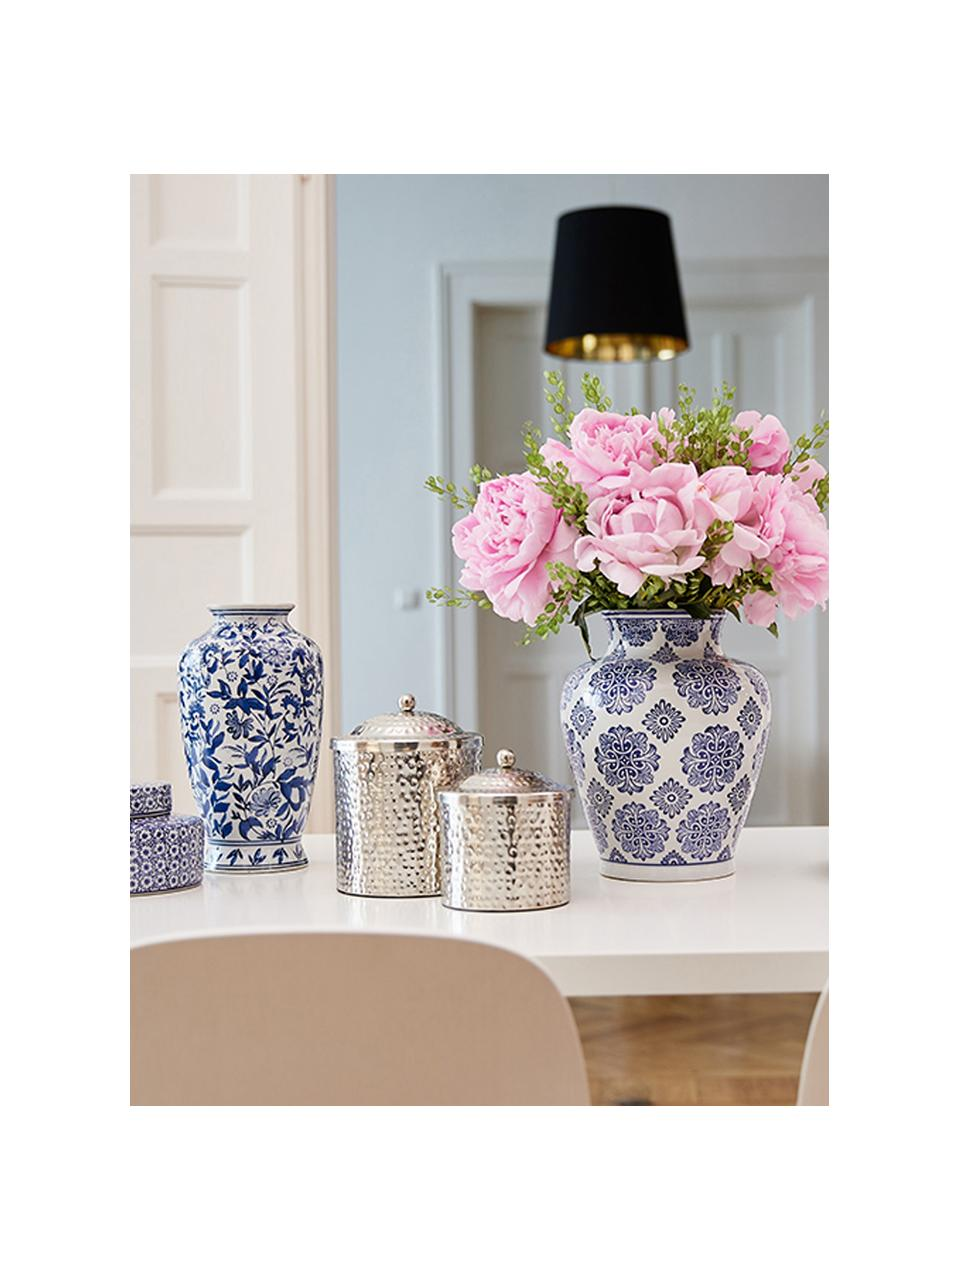 Vaso decorativo in porcellana Lin, Porcellana non impermeabile, Blu, bianco, Ø 16 x Alt. 31 cm